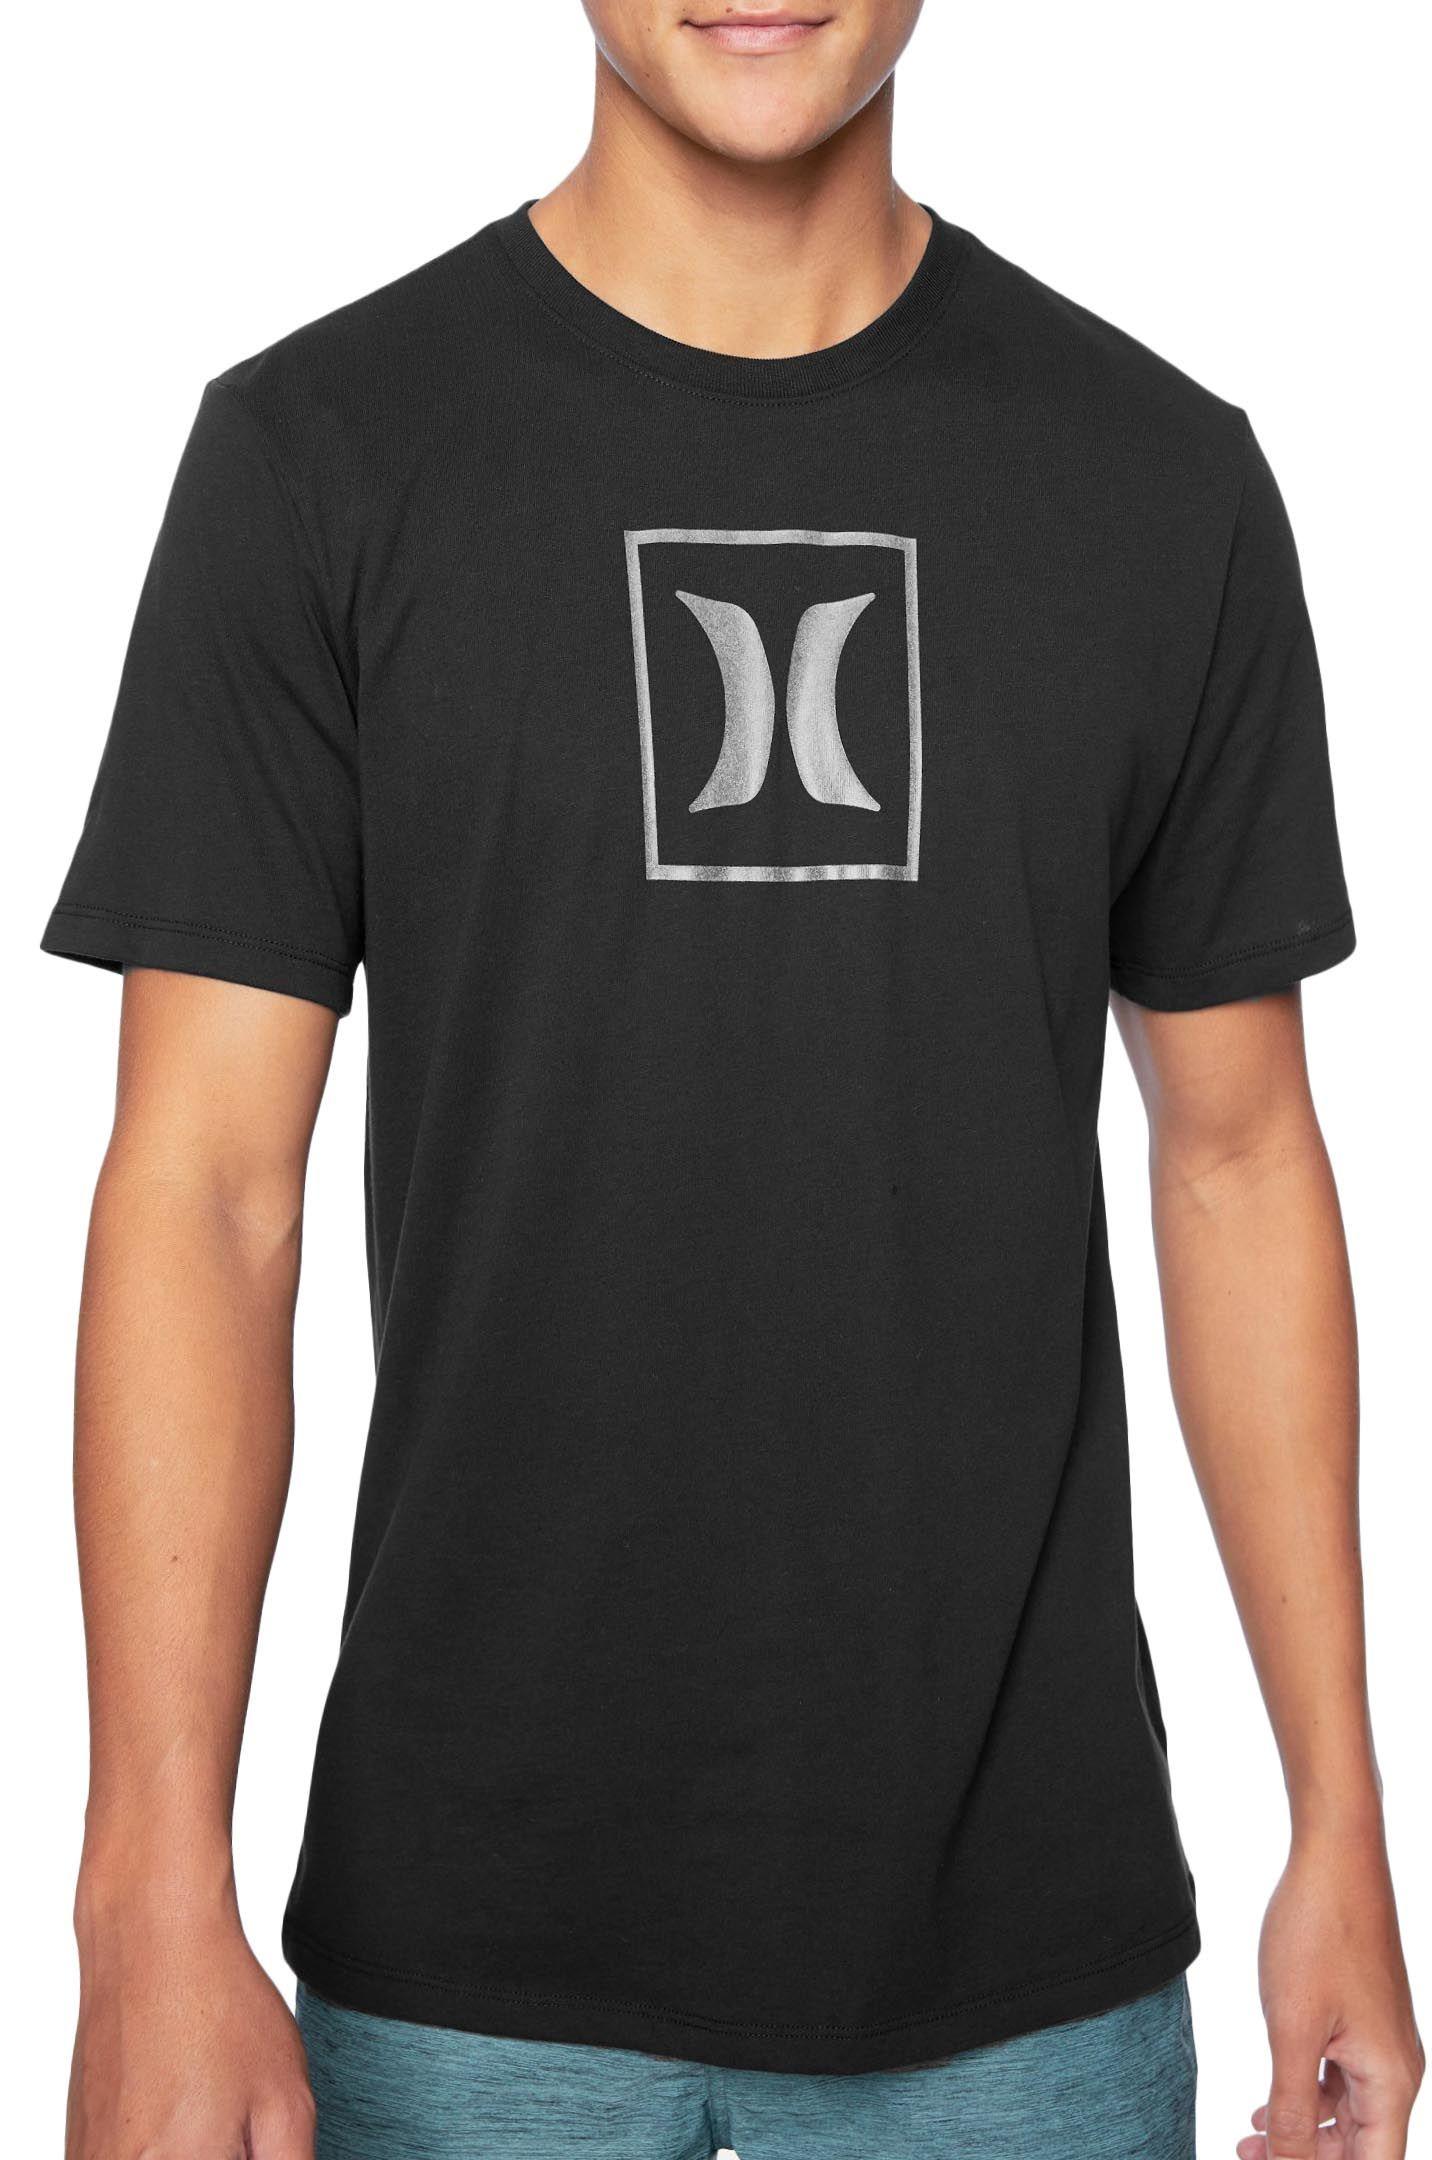 T-Shirt Hurley M DRI-FIT ICON BOX RELFECTIVE S/S Black